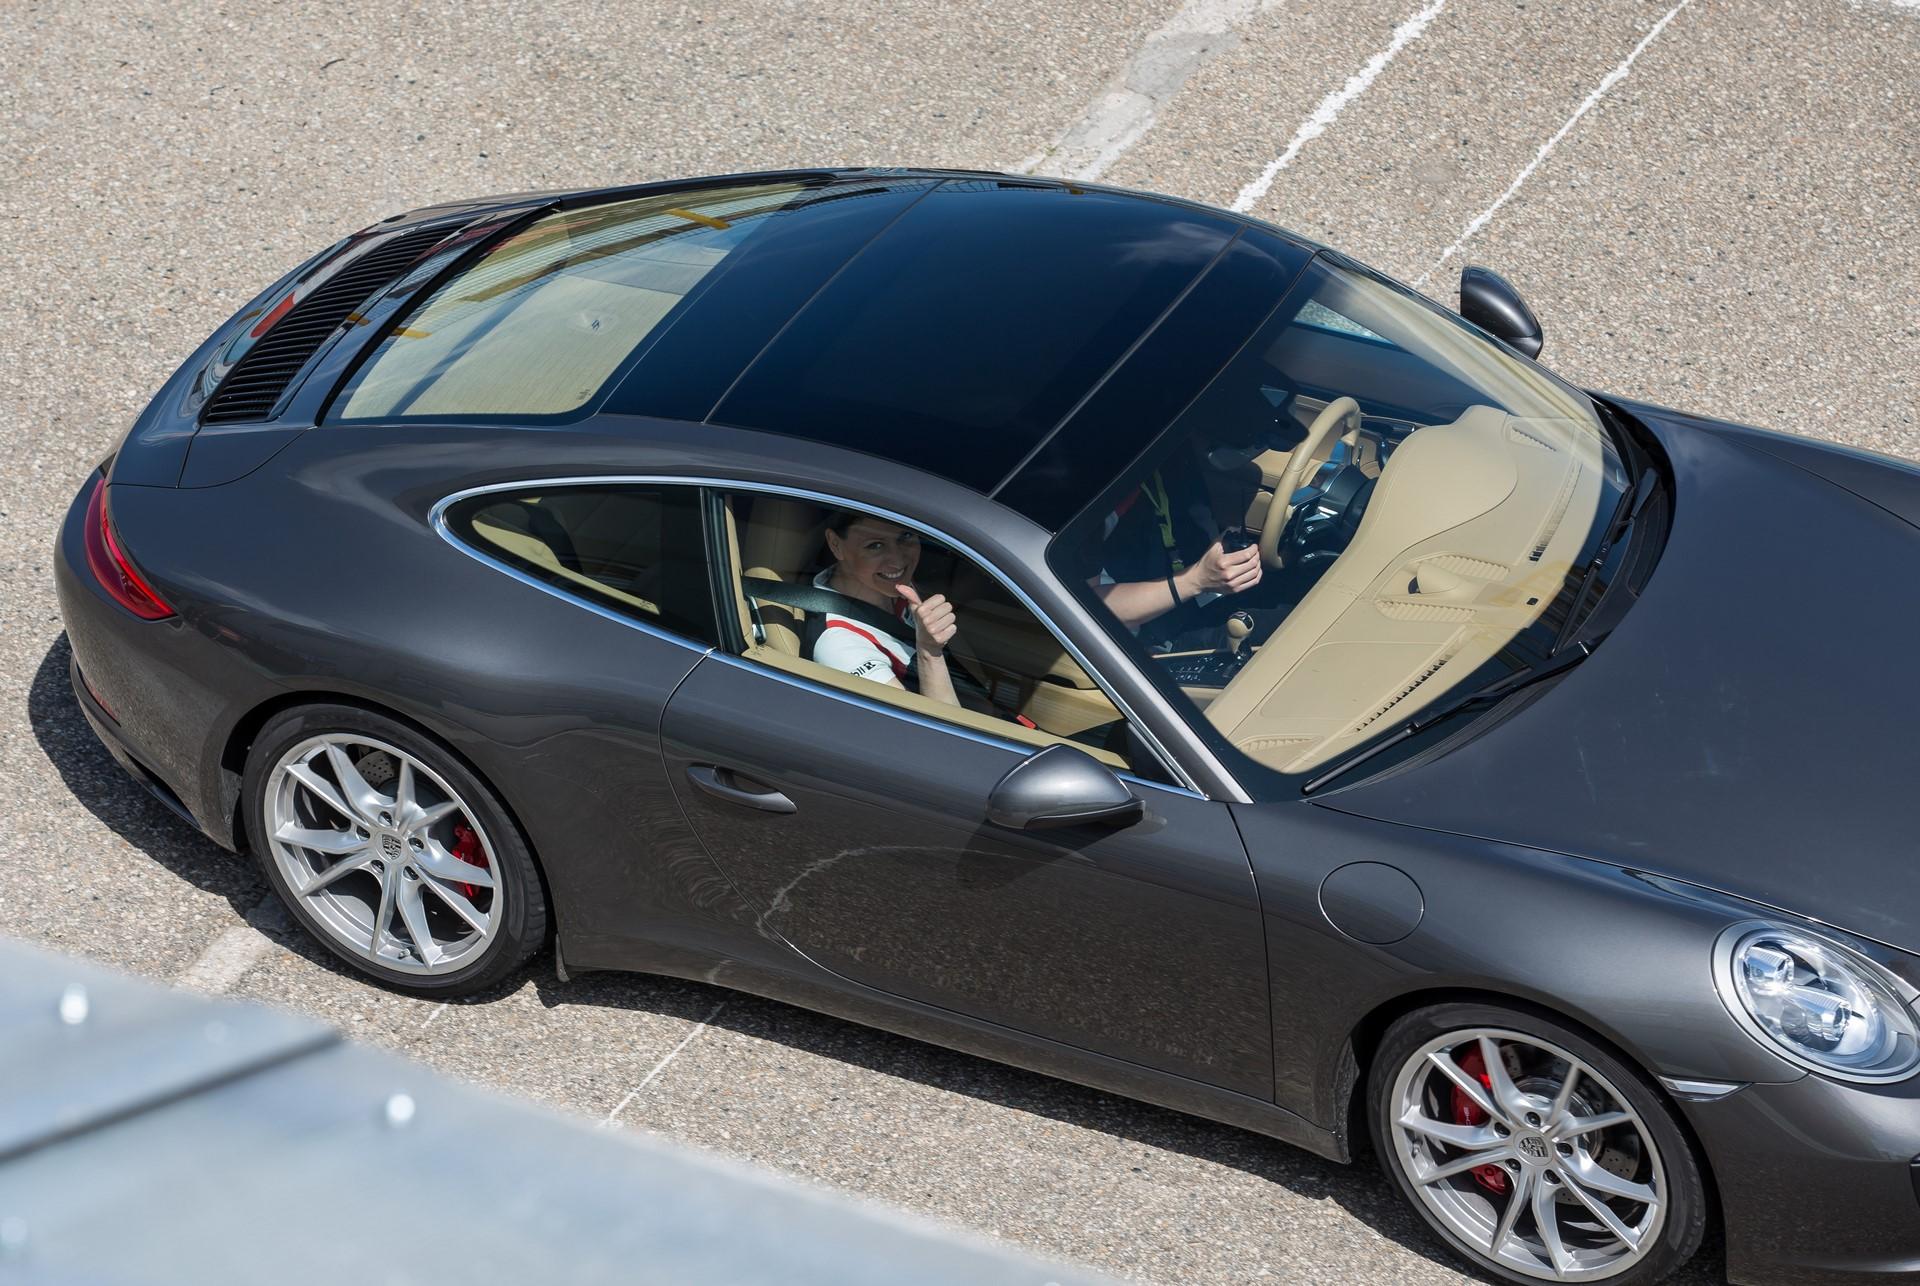 Porsche Driving Experience 2017 Serres (111)